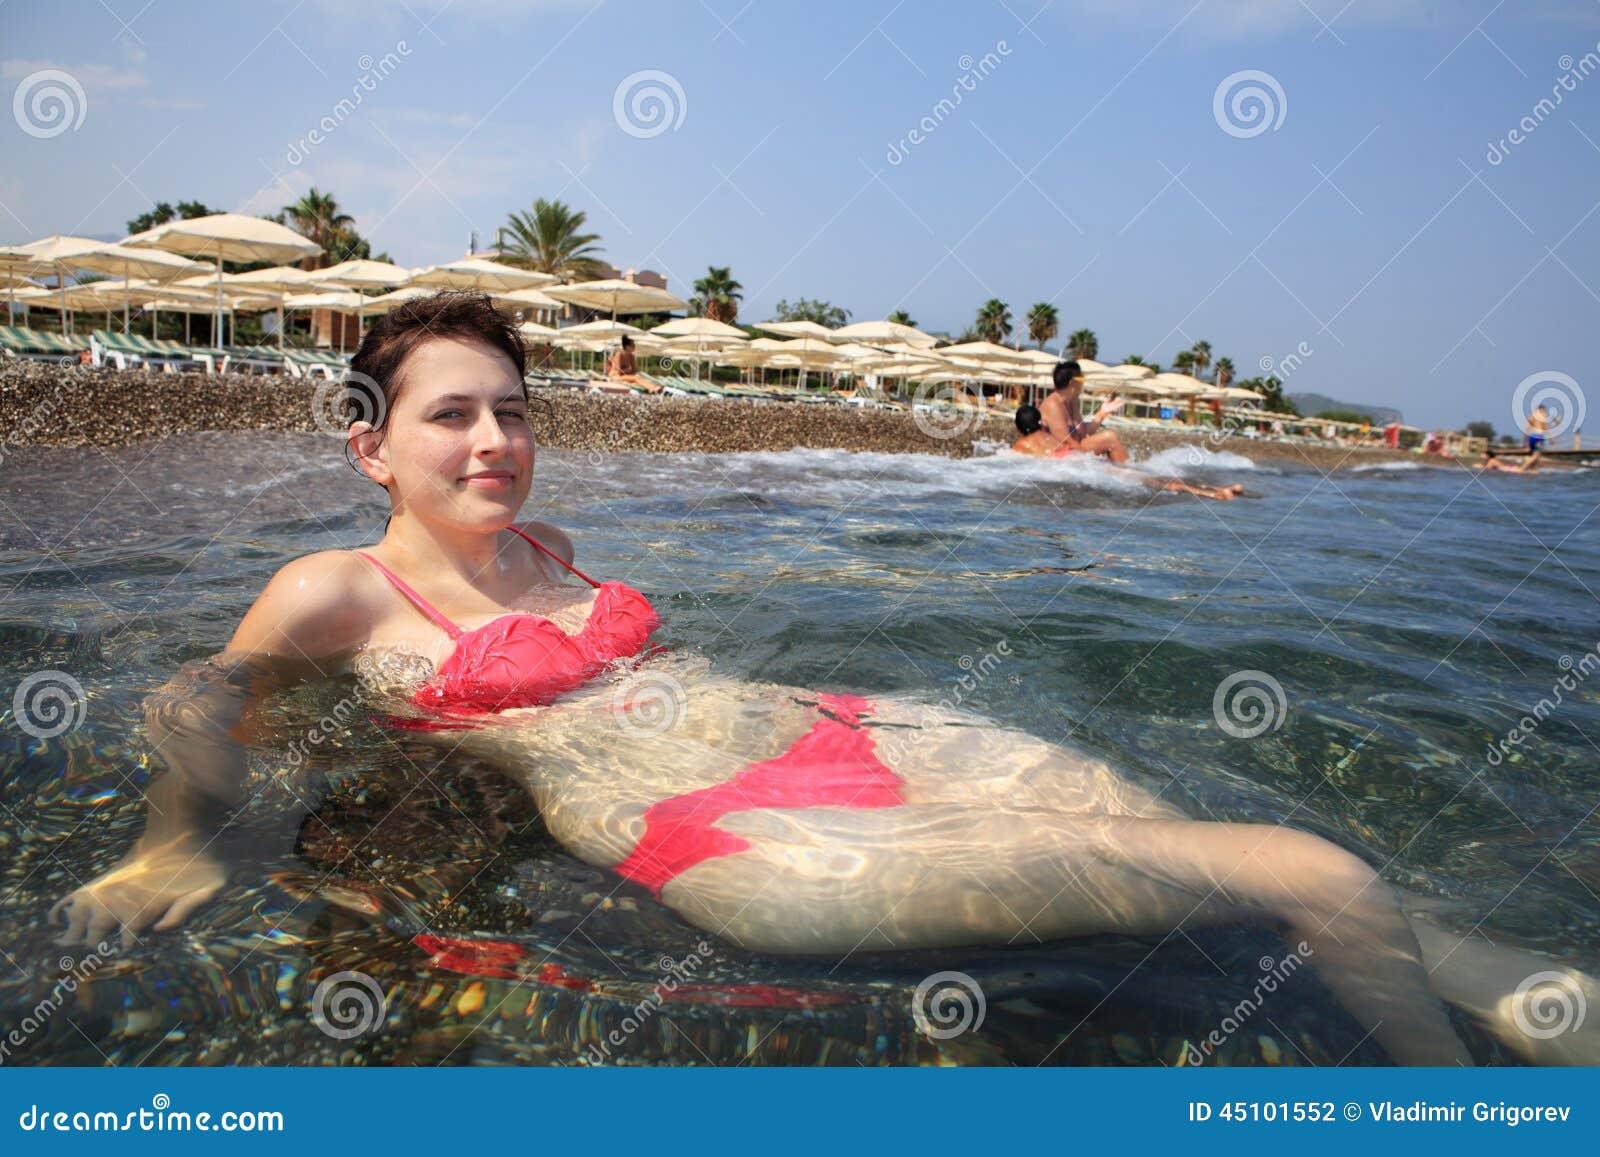 Girl Lying In Surf Mediterranean Sea, Background Of Beach ...